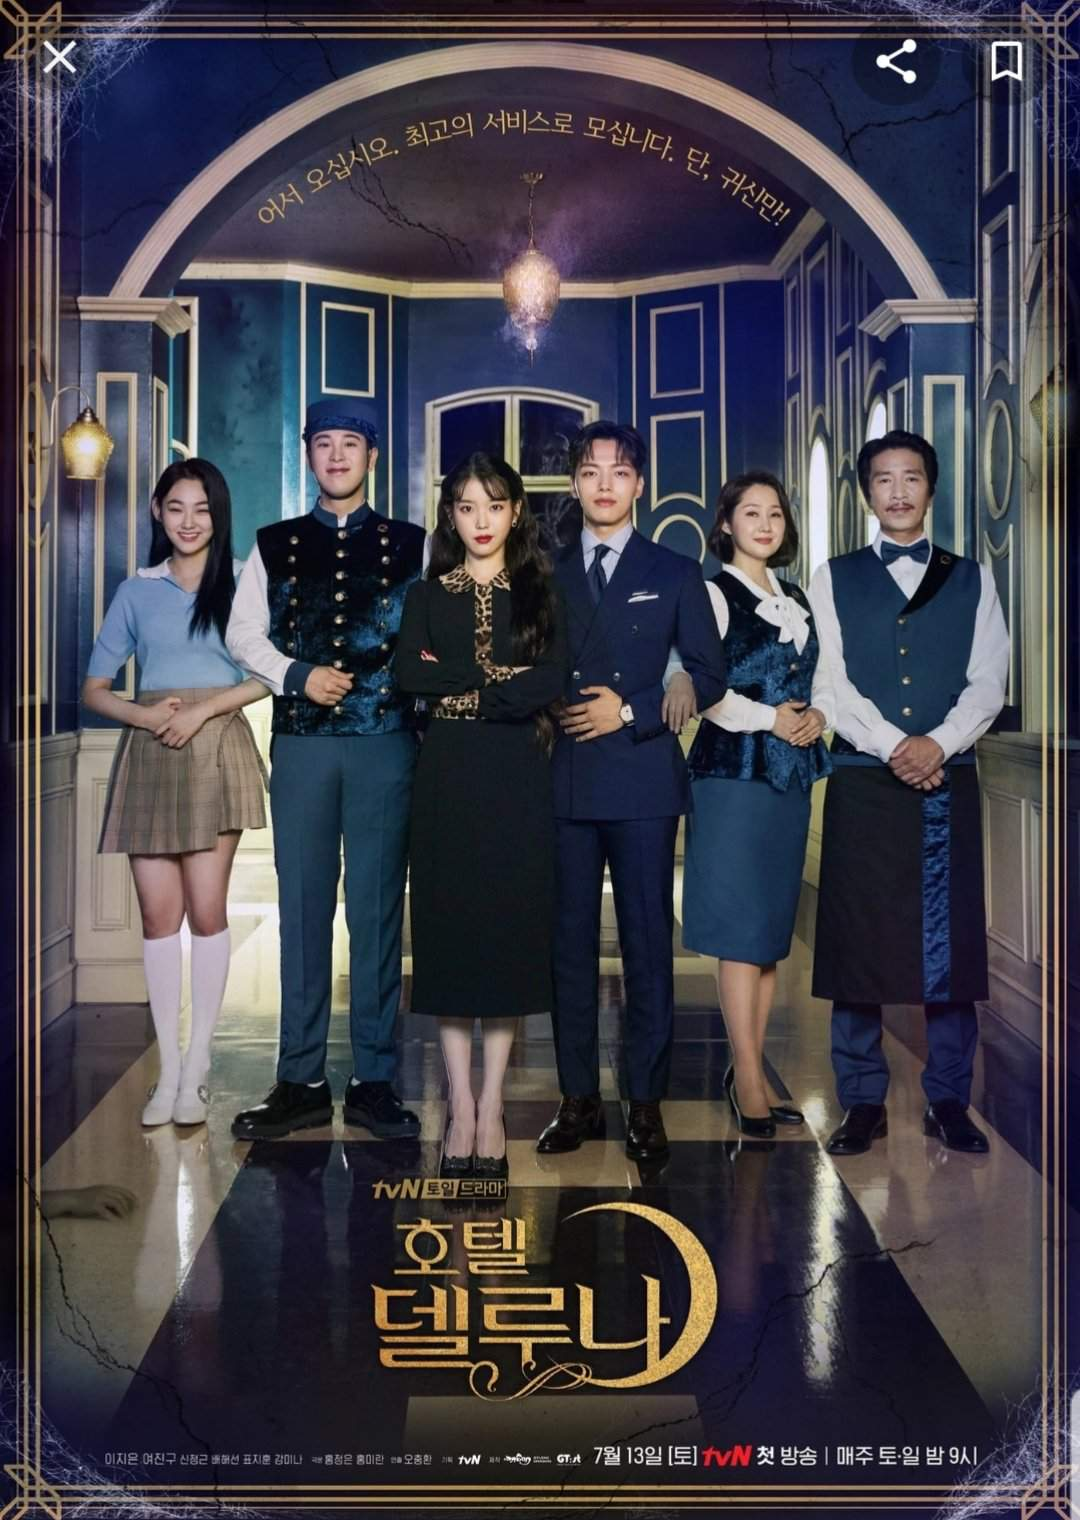 Xem Phim Khách Sạn Ma Quái - Hotel Del Luna